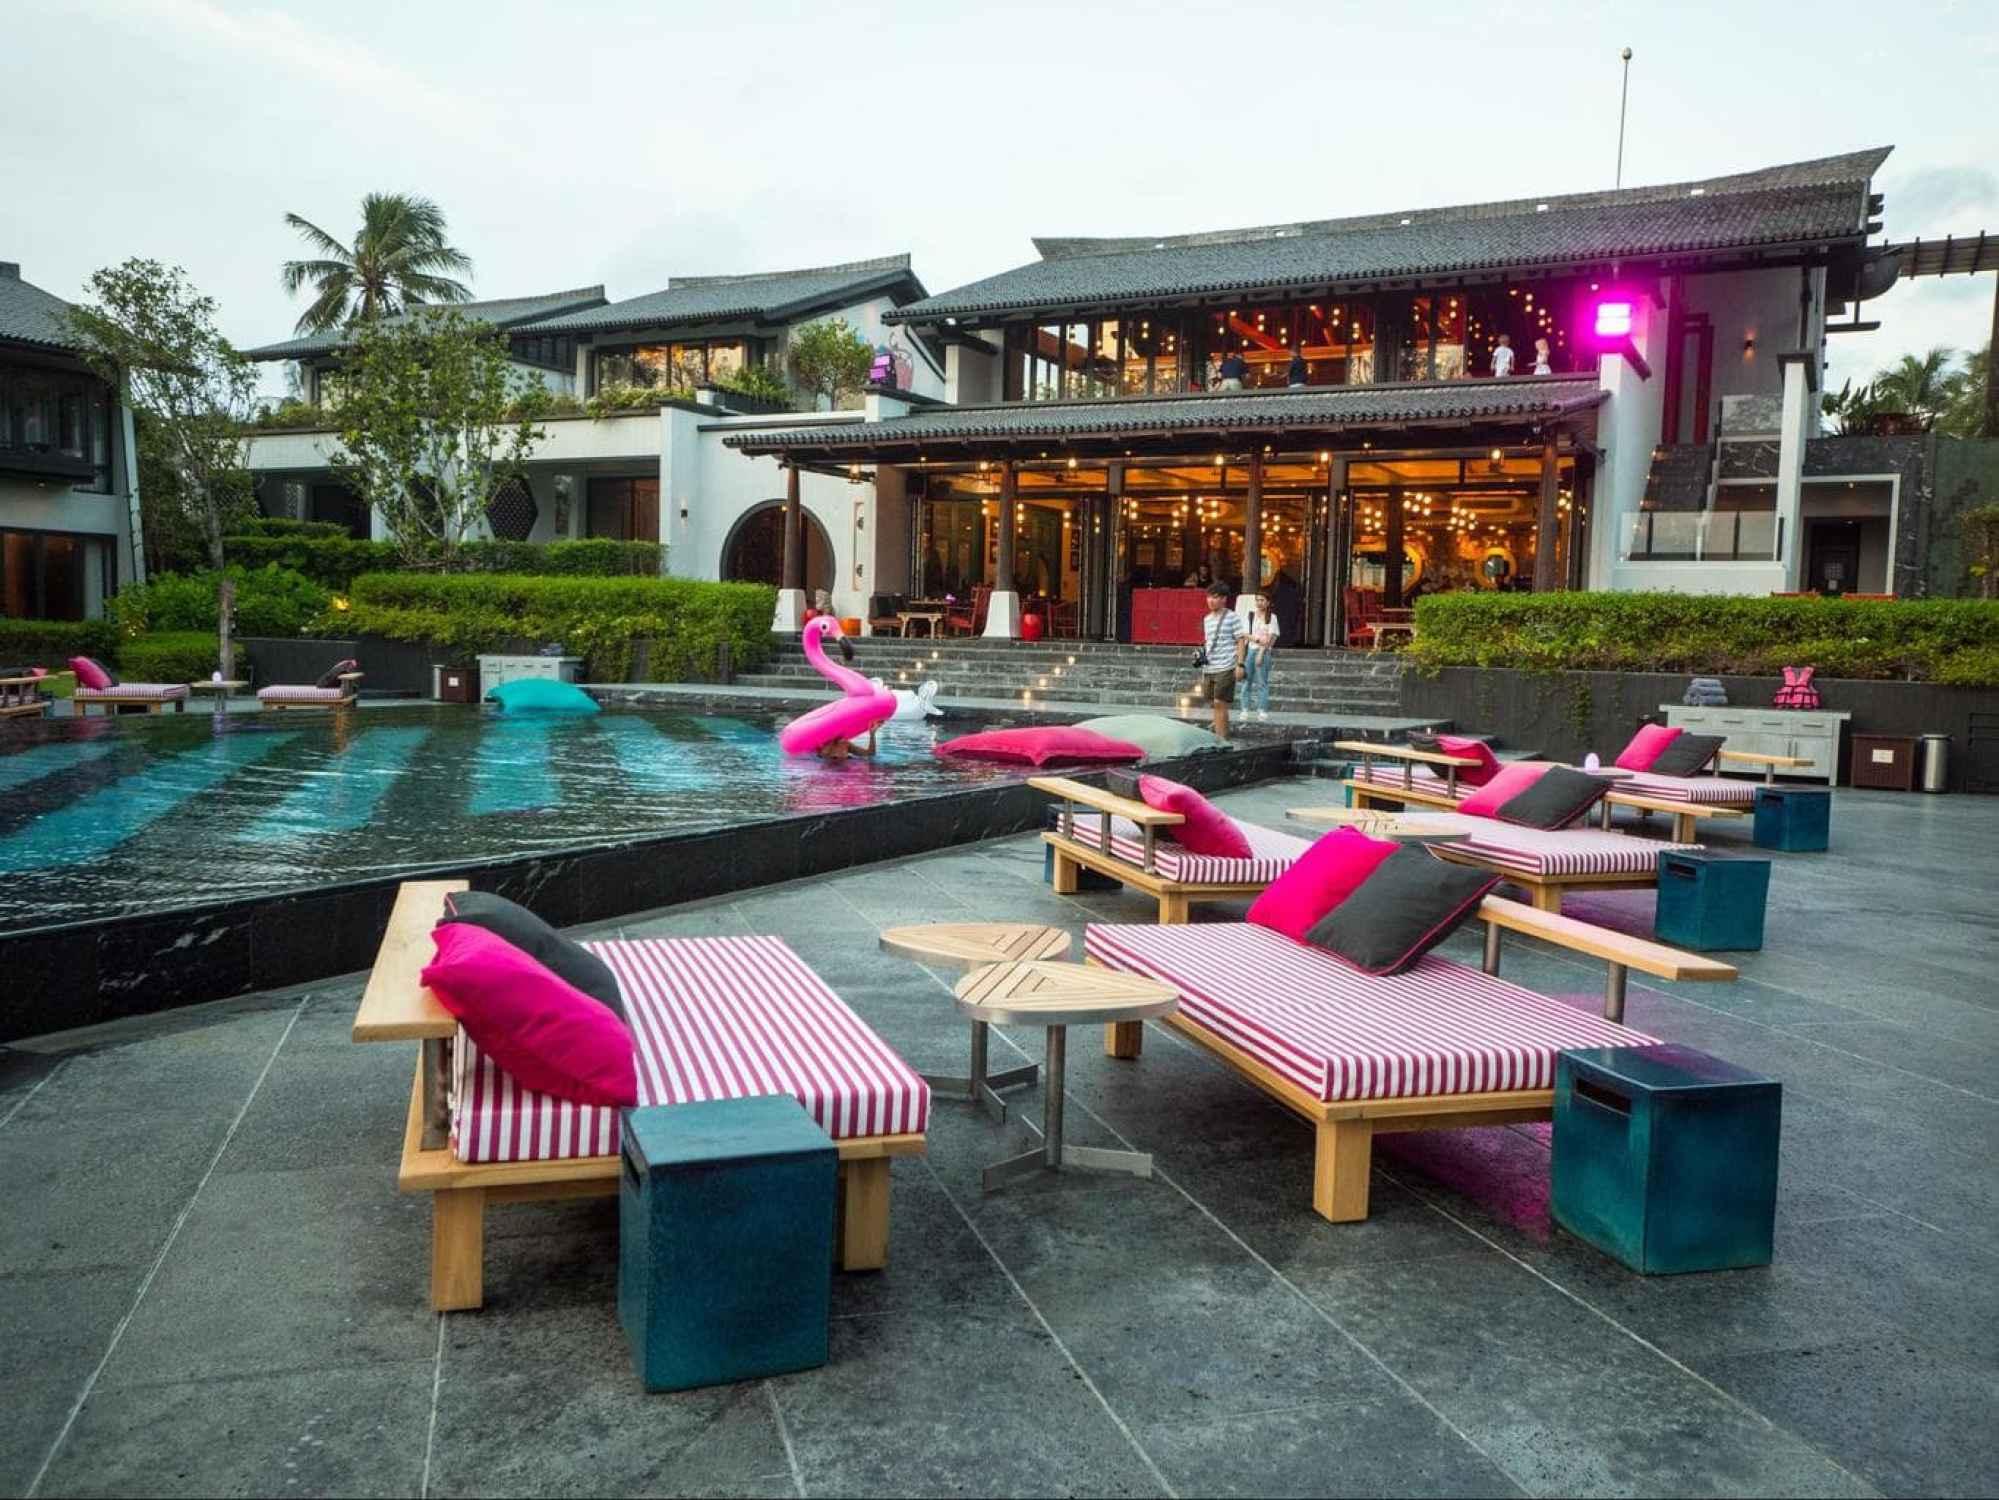 The pool at Baba Beach Club